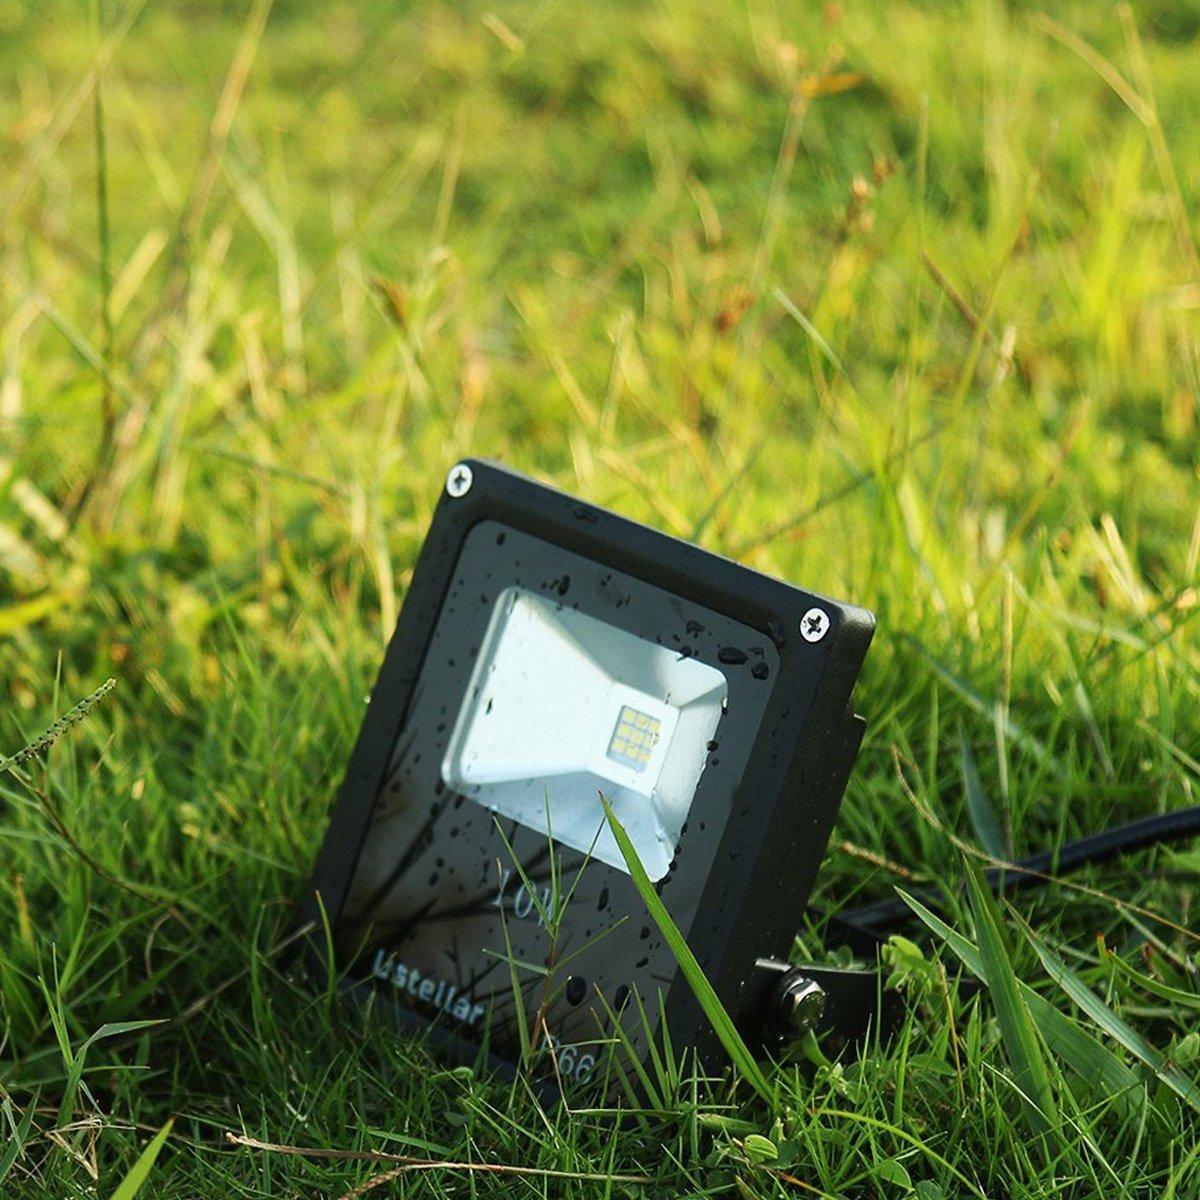 Ustellar 10W Outdoor LED Flood Lights, IP66 Waterproof, 760 Lumen Super Bright Floodlight, Equivalent 100W Halgen Bulb, 6000K Daylight White Security Lights